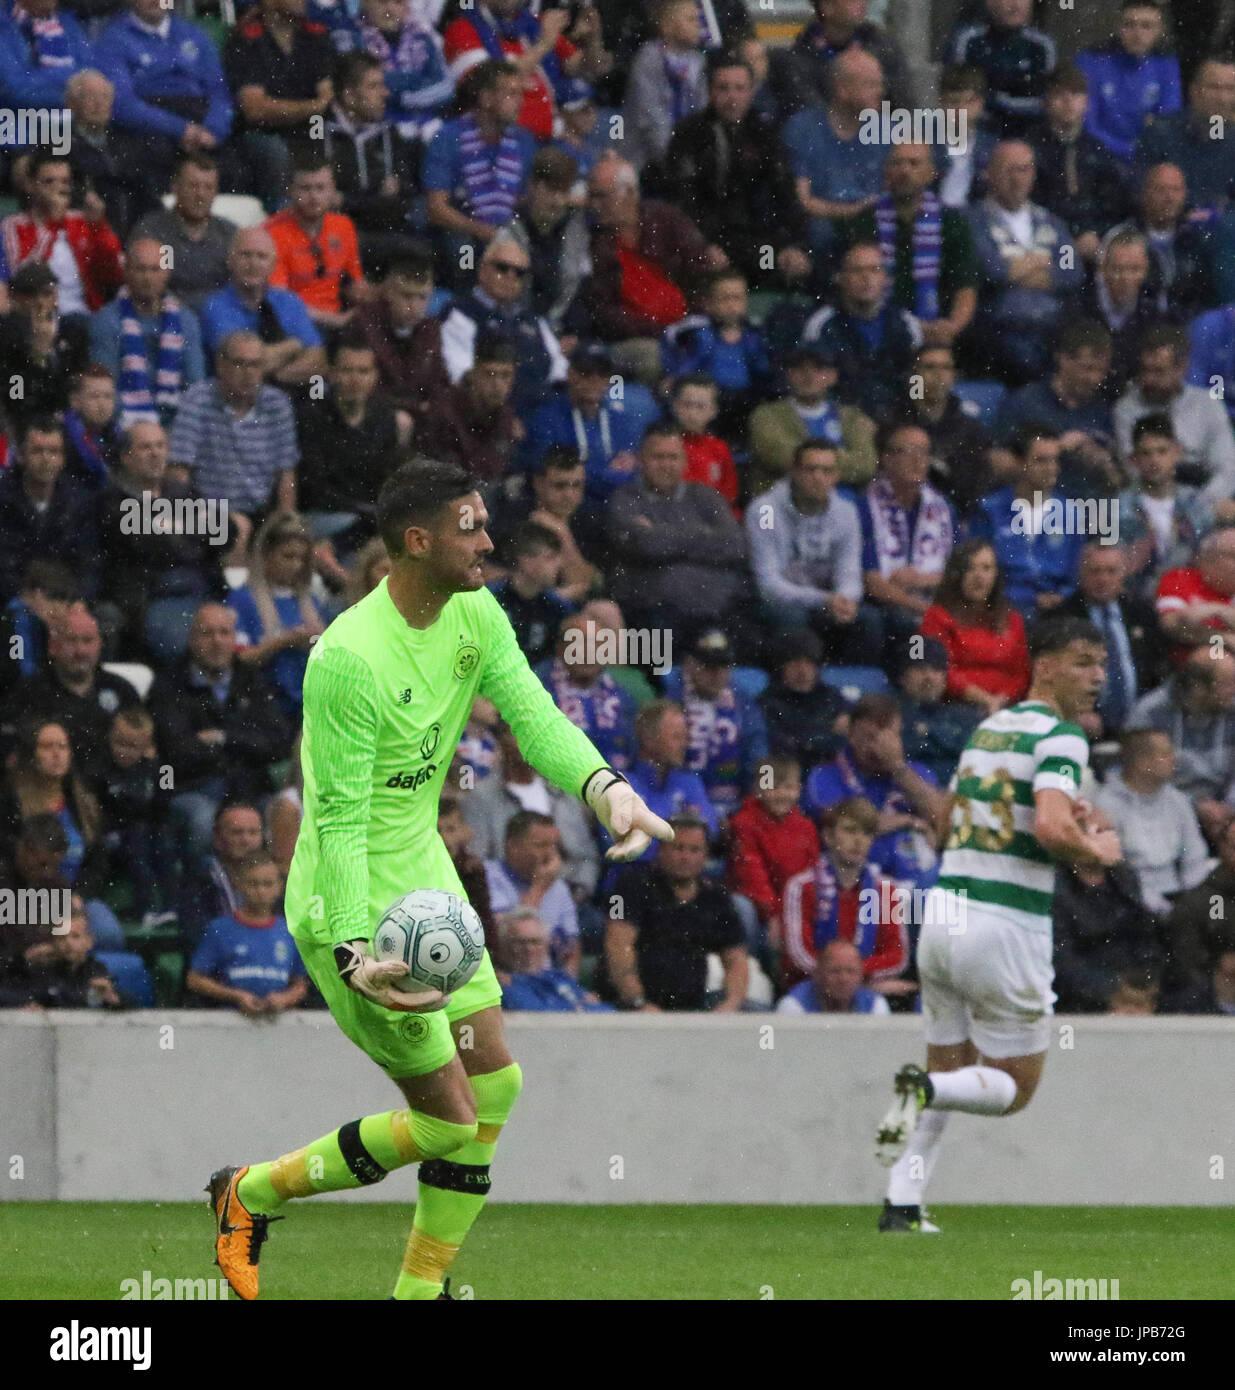 Windsor Park, Belfast, Northern Ireland. 14th July. Linfield 0 Celtic 2. Celtic's Craig Gordon (1) in action. - Stock Image